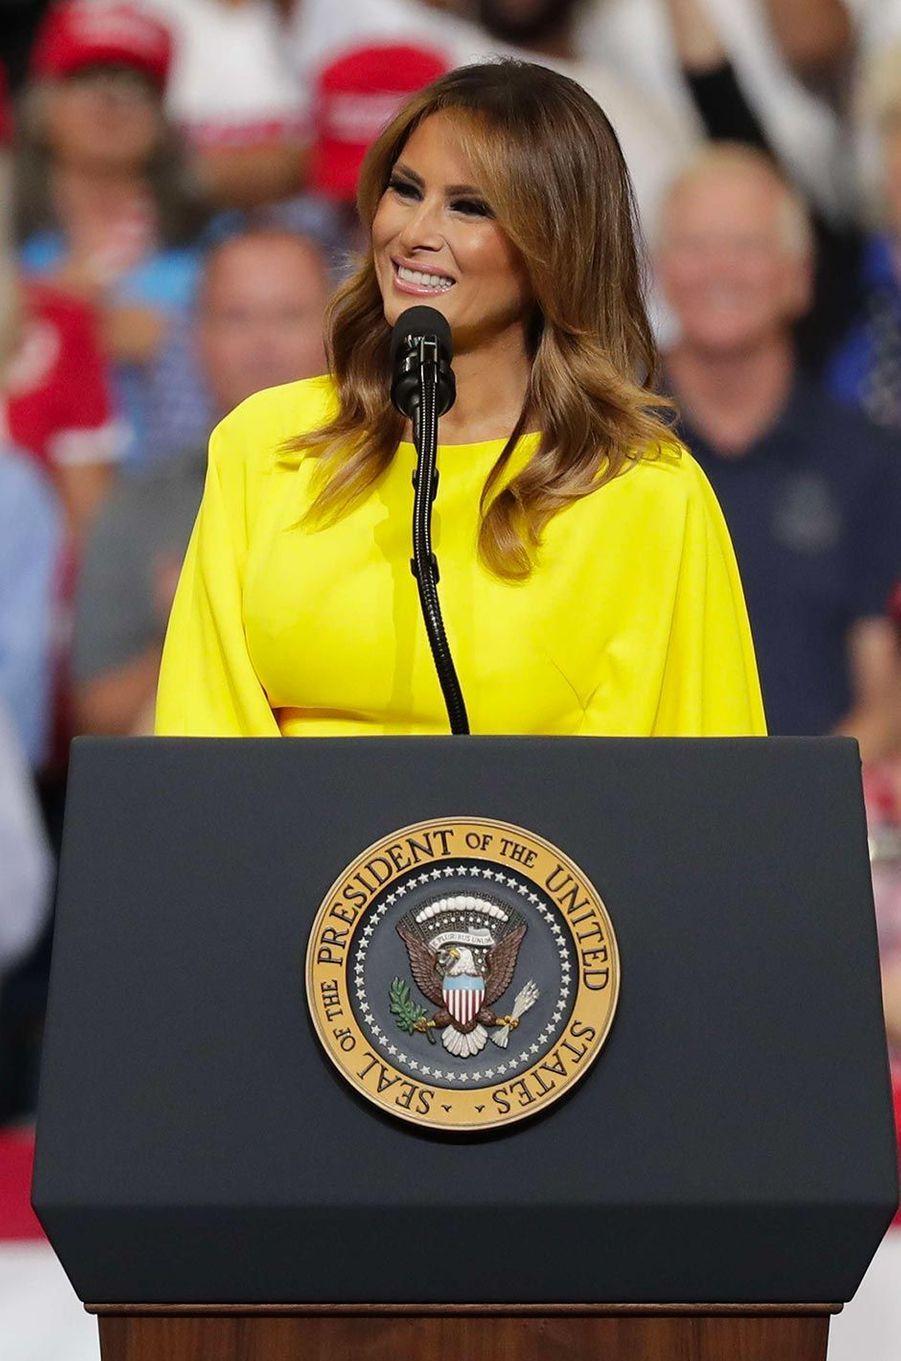 Melania Trump lors d'un meeting à Orlando, en Floride, le 18 juin 2019.